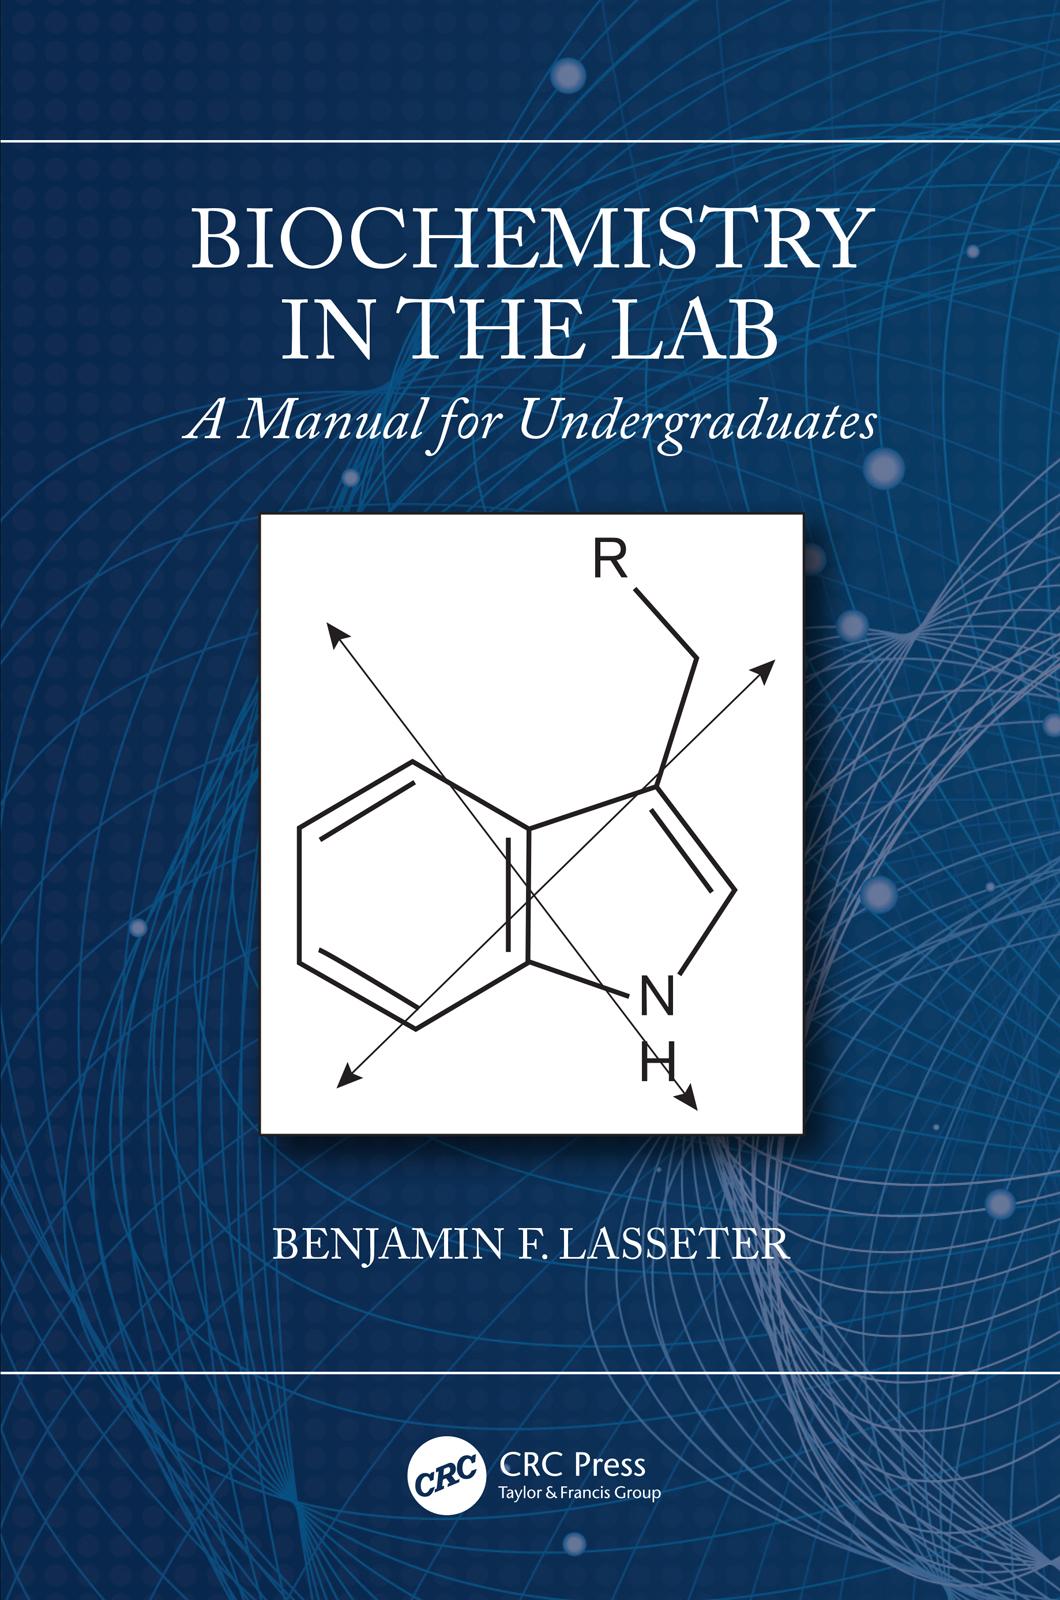 Biochemistry in the Lab